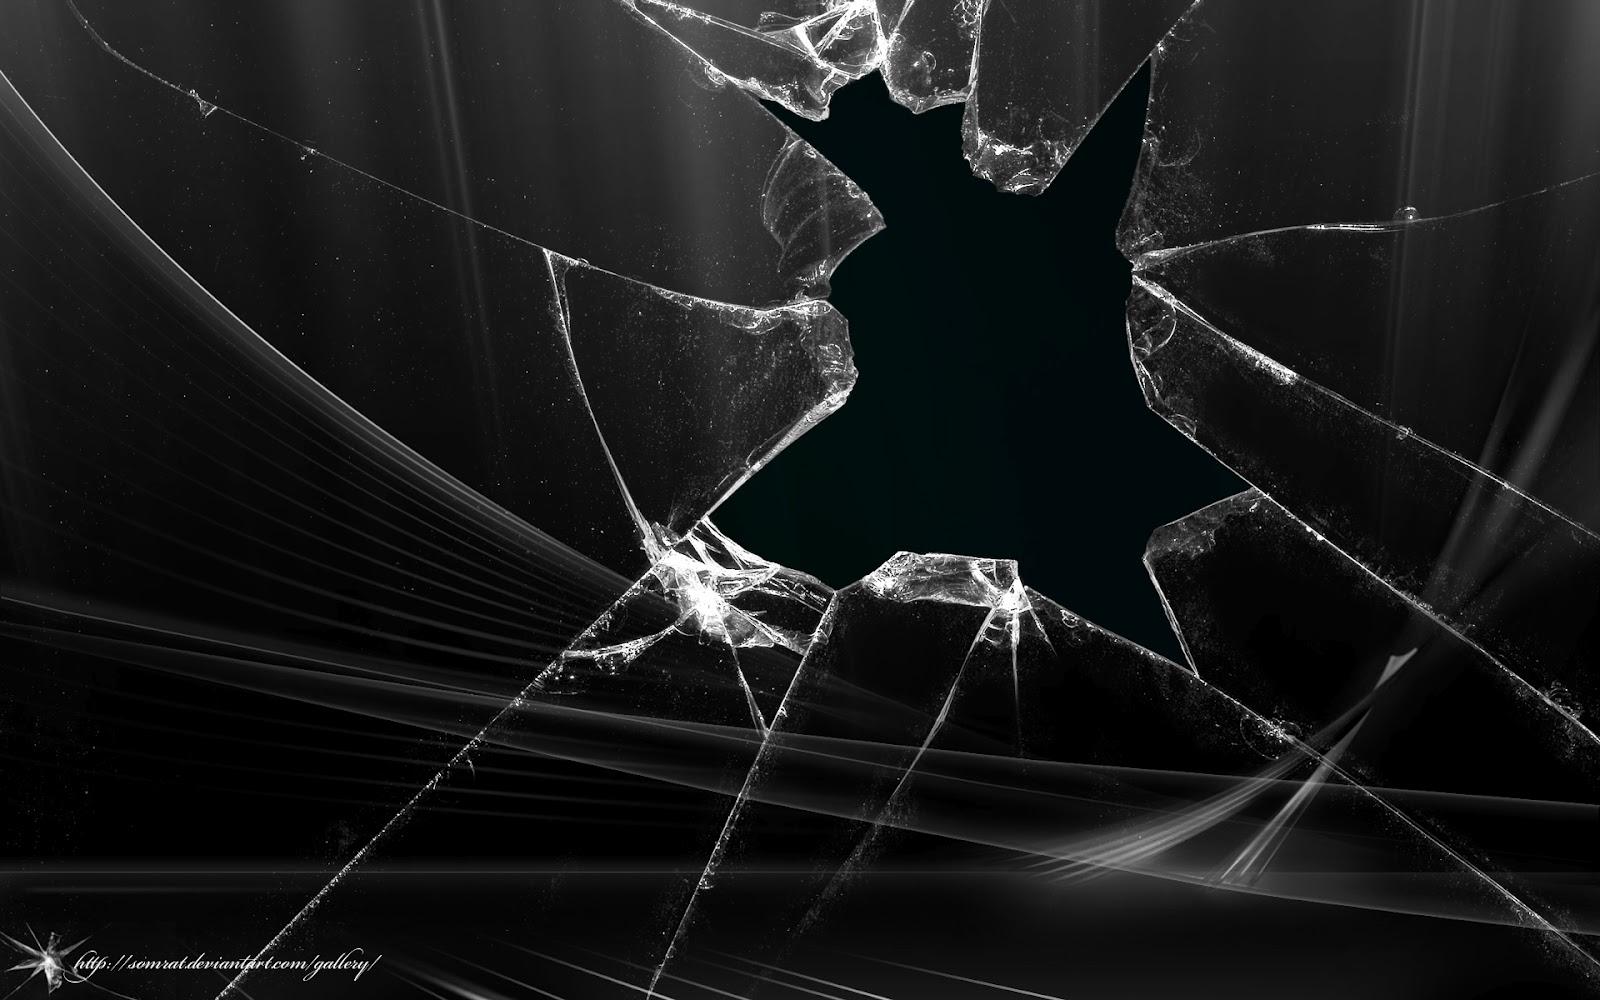 http://3.bp.blogspot.com/-m2qc4eJc_XY/T1Xi96AS2gI/AAAAAAAAAnY/n3f_IokiWc8/s1600/Broken_Aero_Vista___Black___by_somrat.jpg